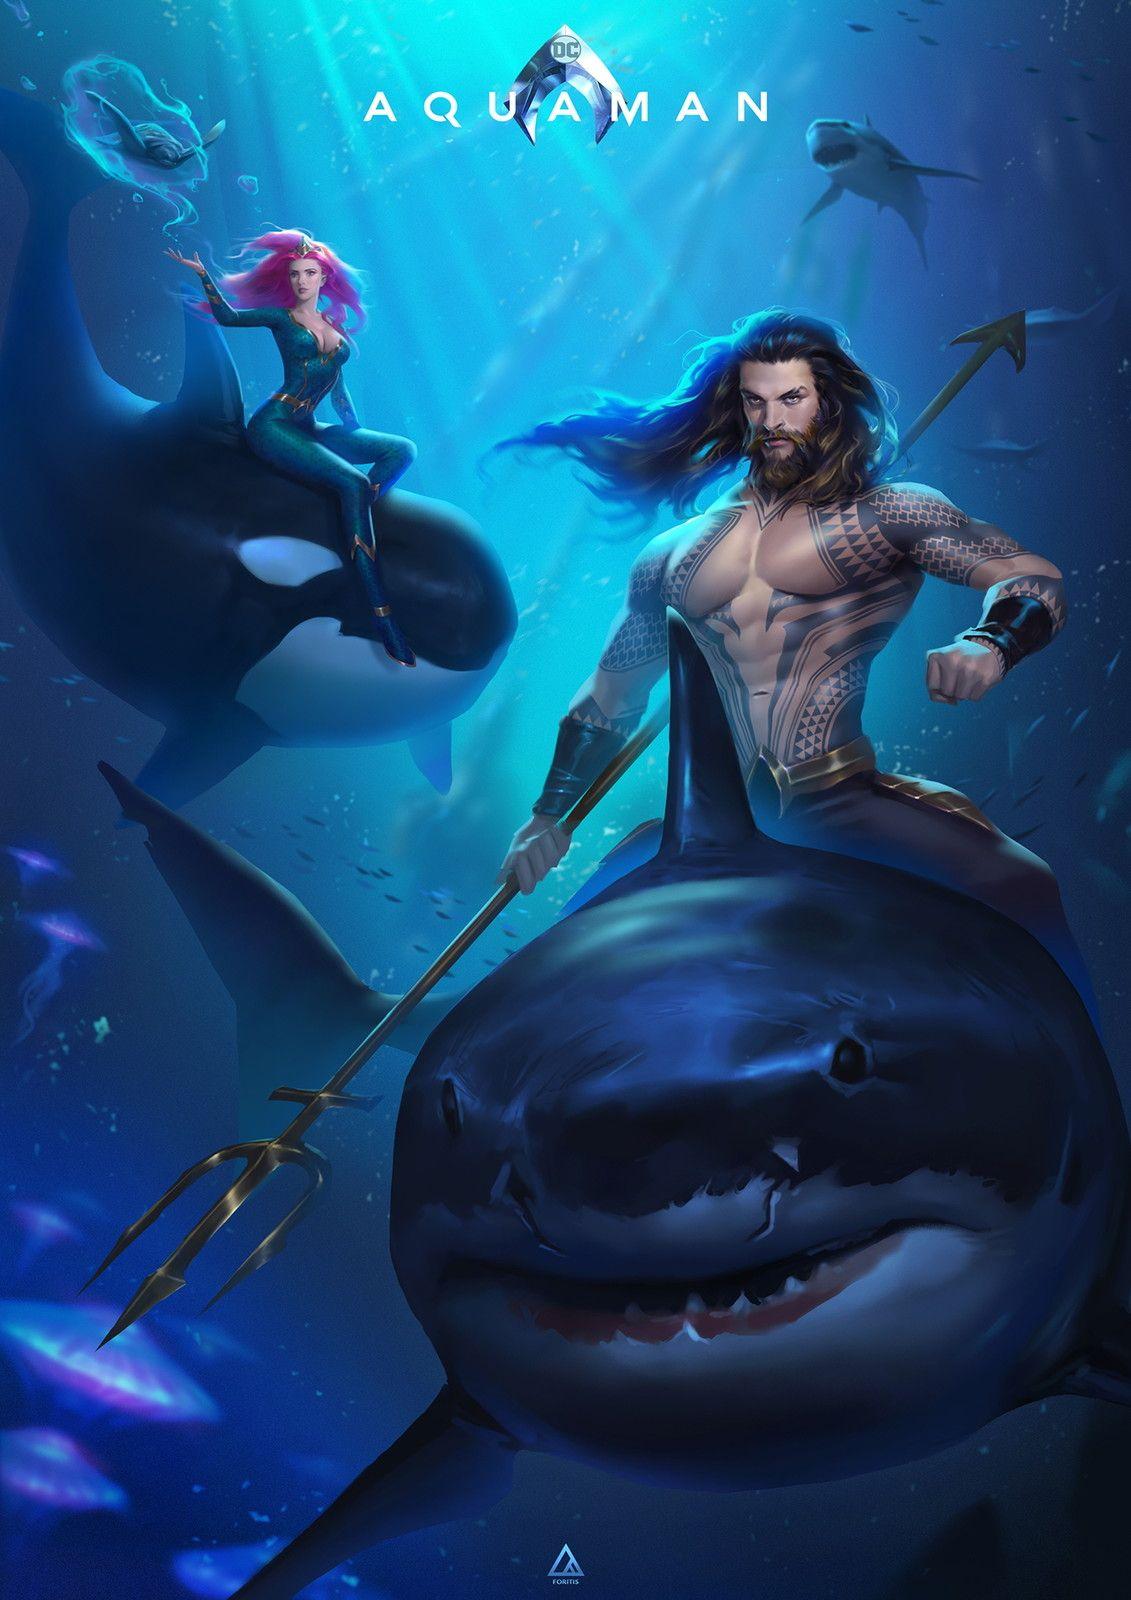 Aquaman Fanart Foritis Wong On Artstation At Https Www Artstation Com Artwork W2b0kx Aquaman Comic Aquaman Dc Comics Heroes